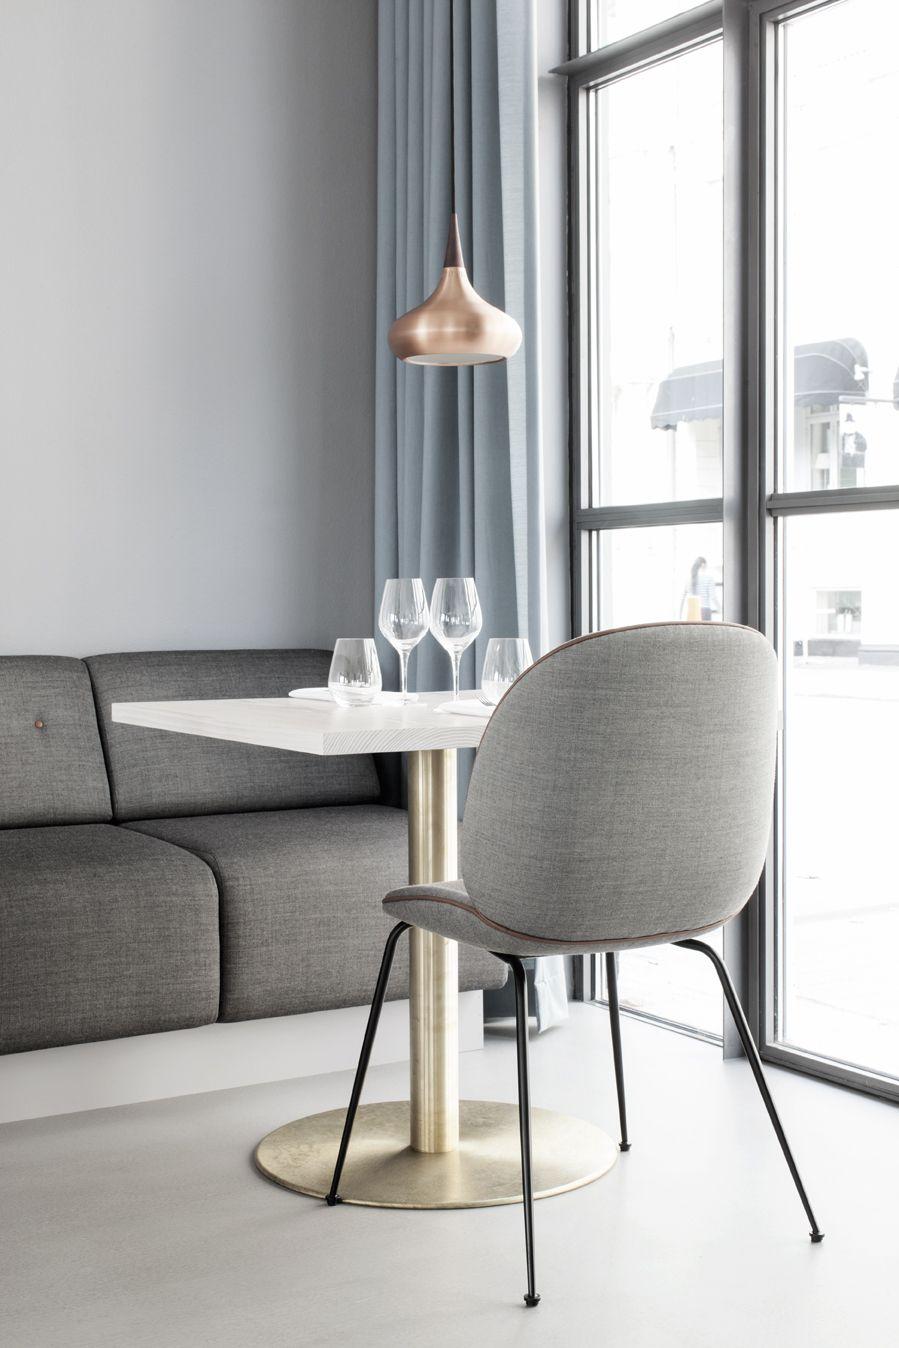 Mg 5915 Jpg Chaise Restaurant Mobilier De Salon Interieurs De